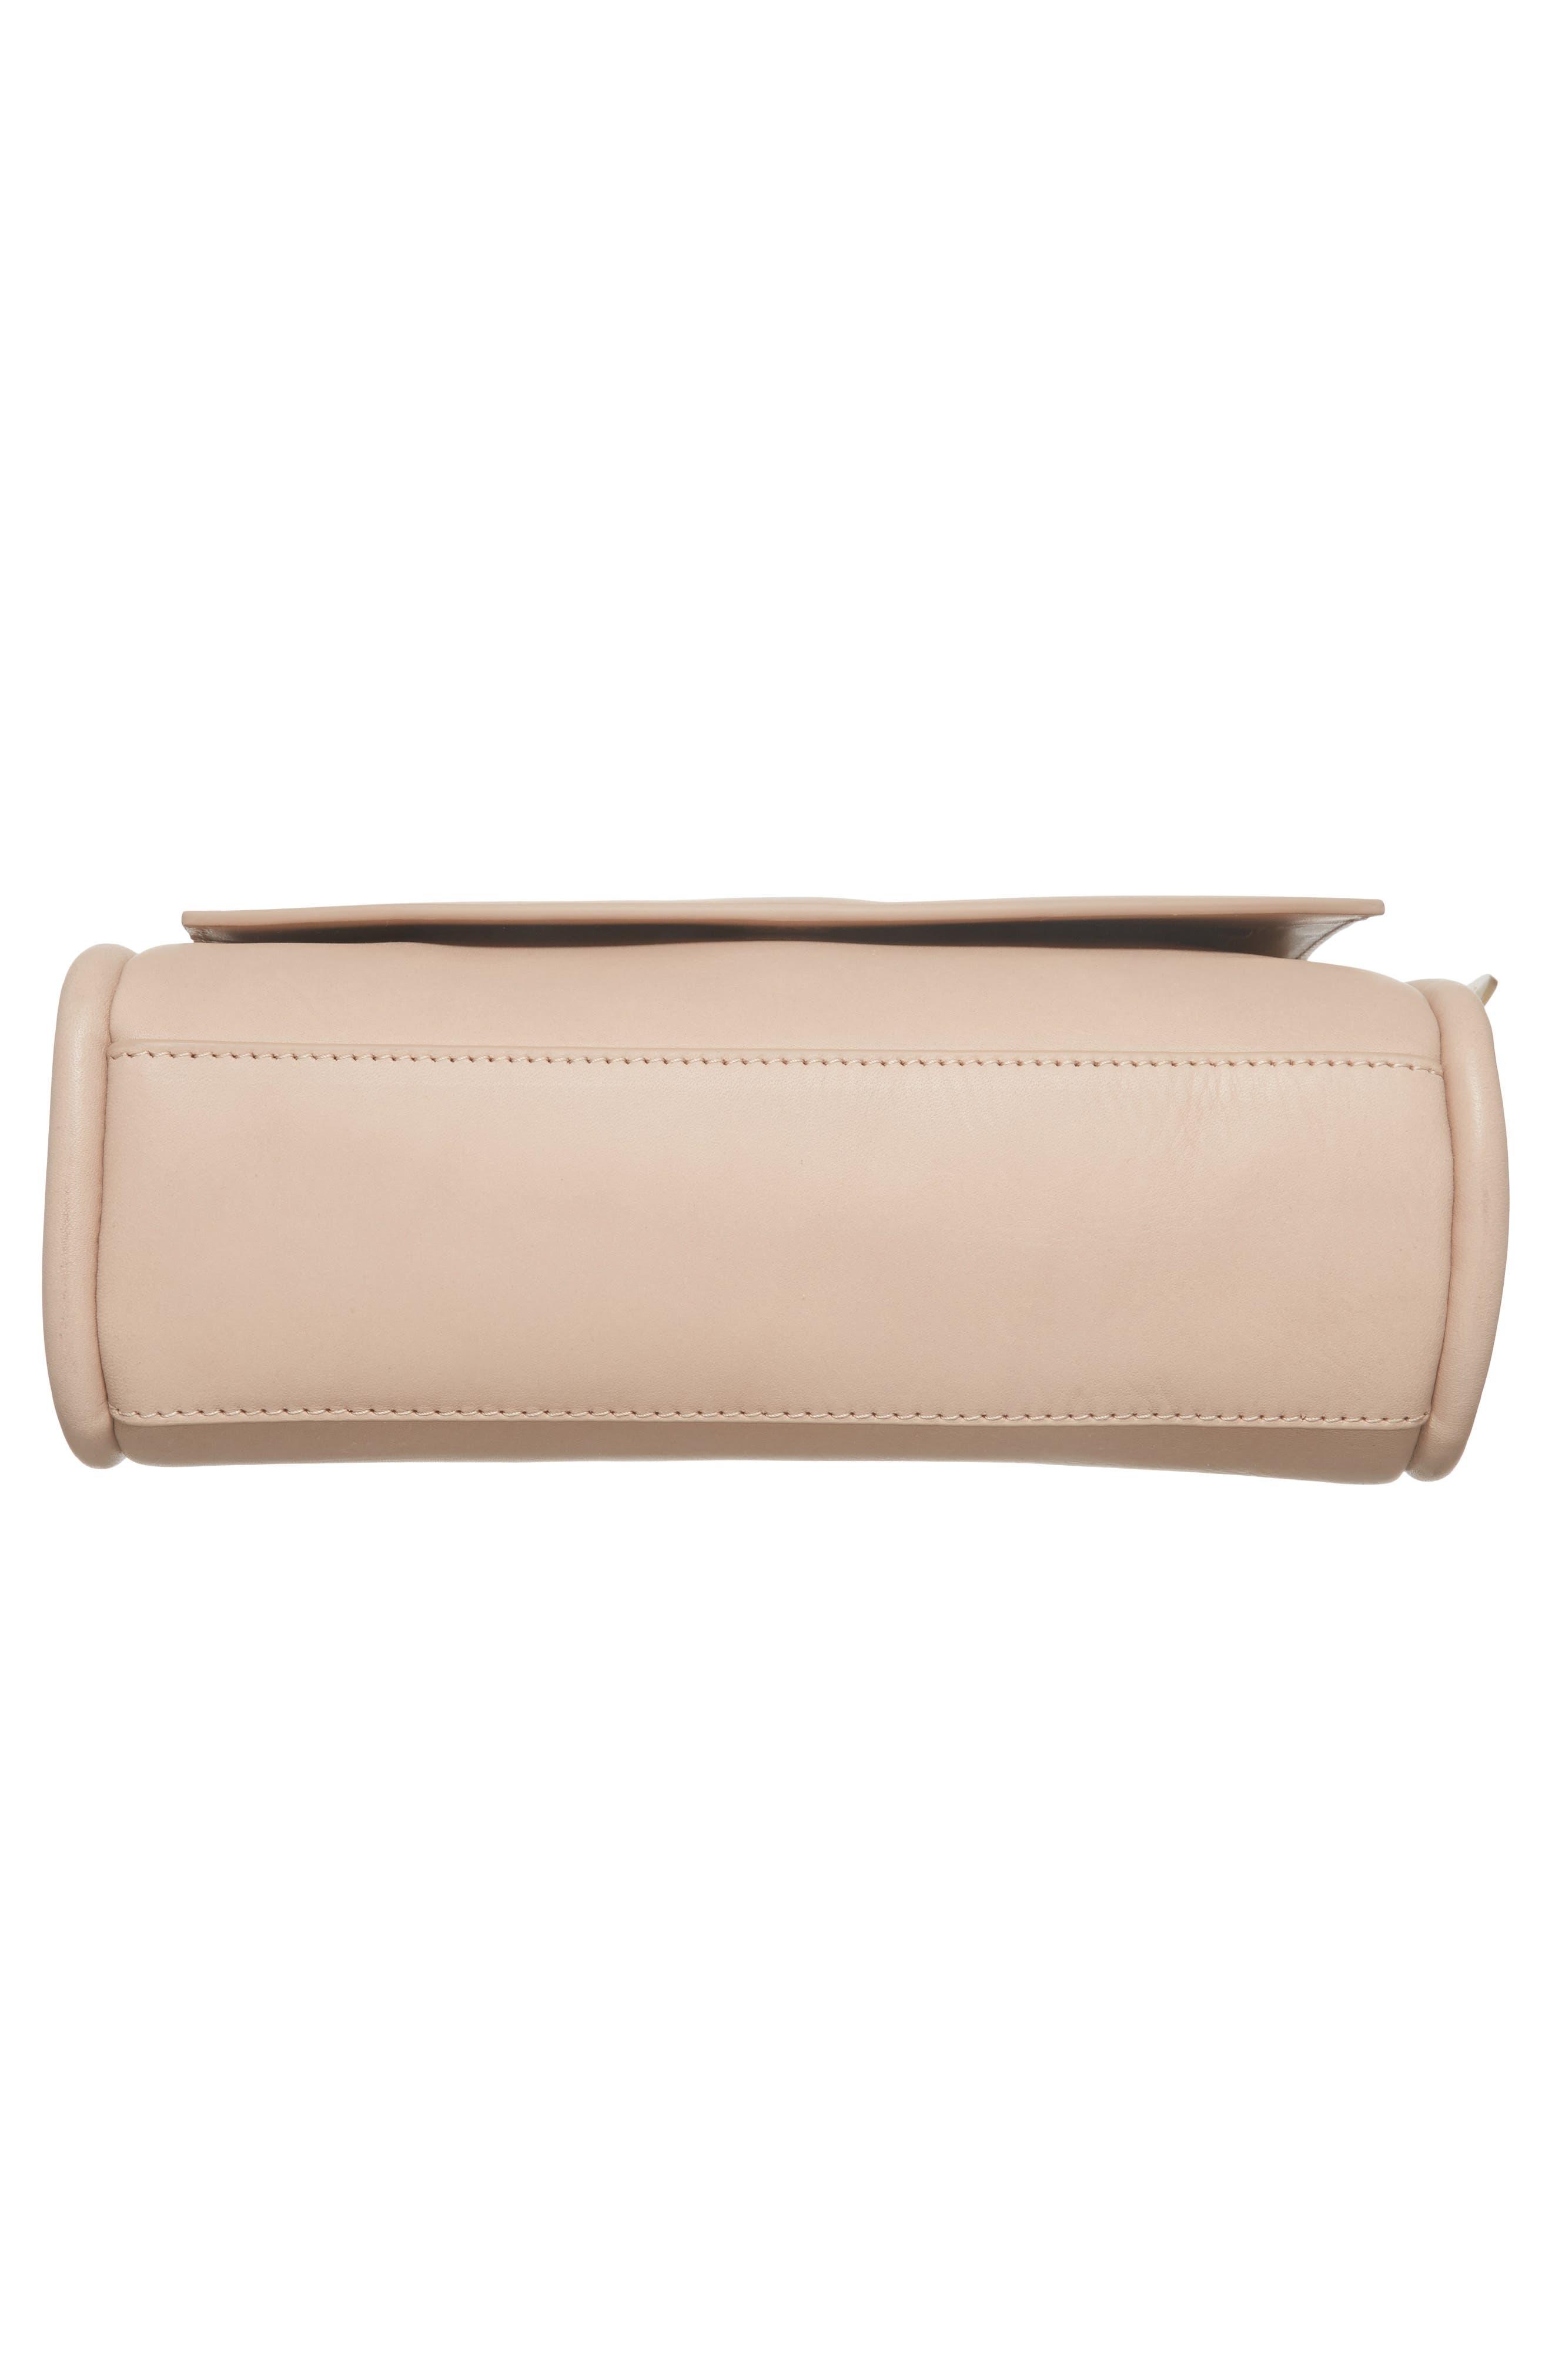 Sylvi Calfskin Leather Crossbody Bag,                             Alternate thumbnail 6, color,                             251